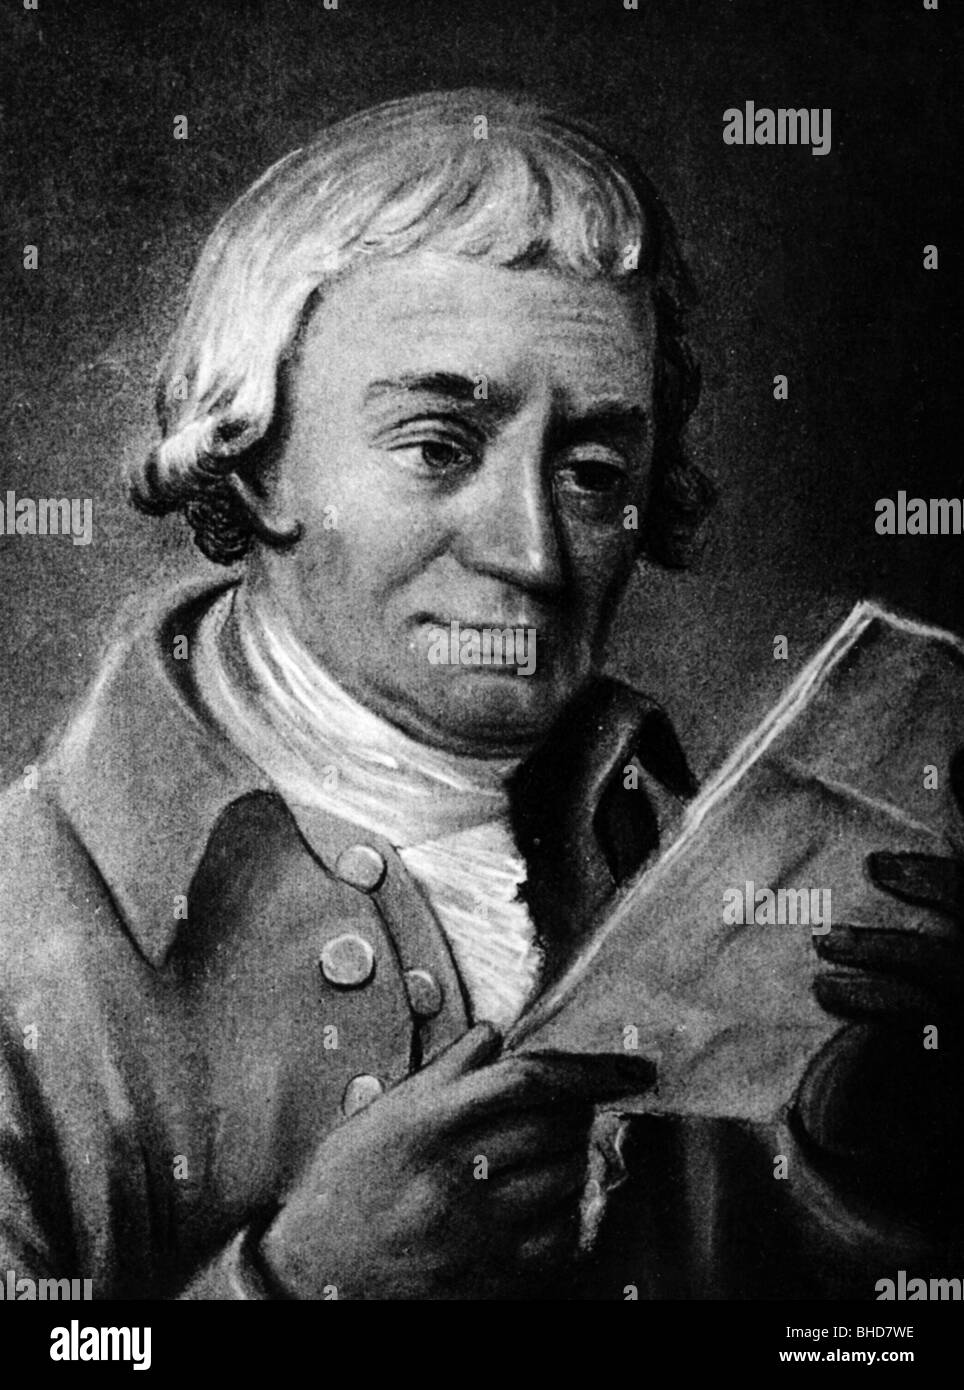 Heyne, Christian Gottlob, 25.9.1729 - 14.7.1812, German philologist, portrait, chalk drawing by J.E. Strecker, Additional - Stock Image